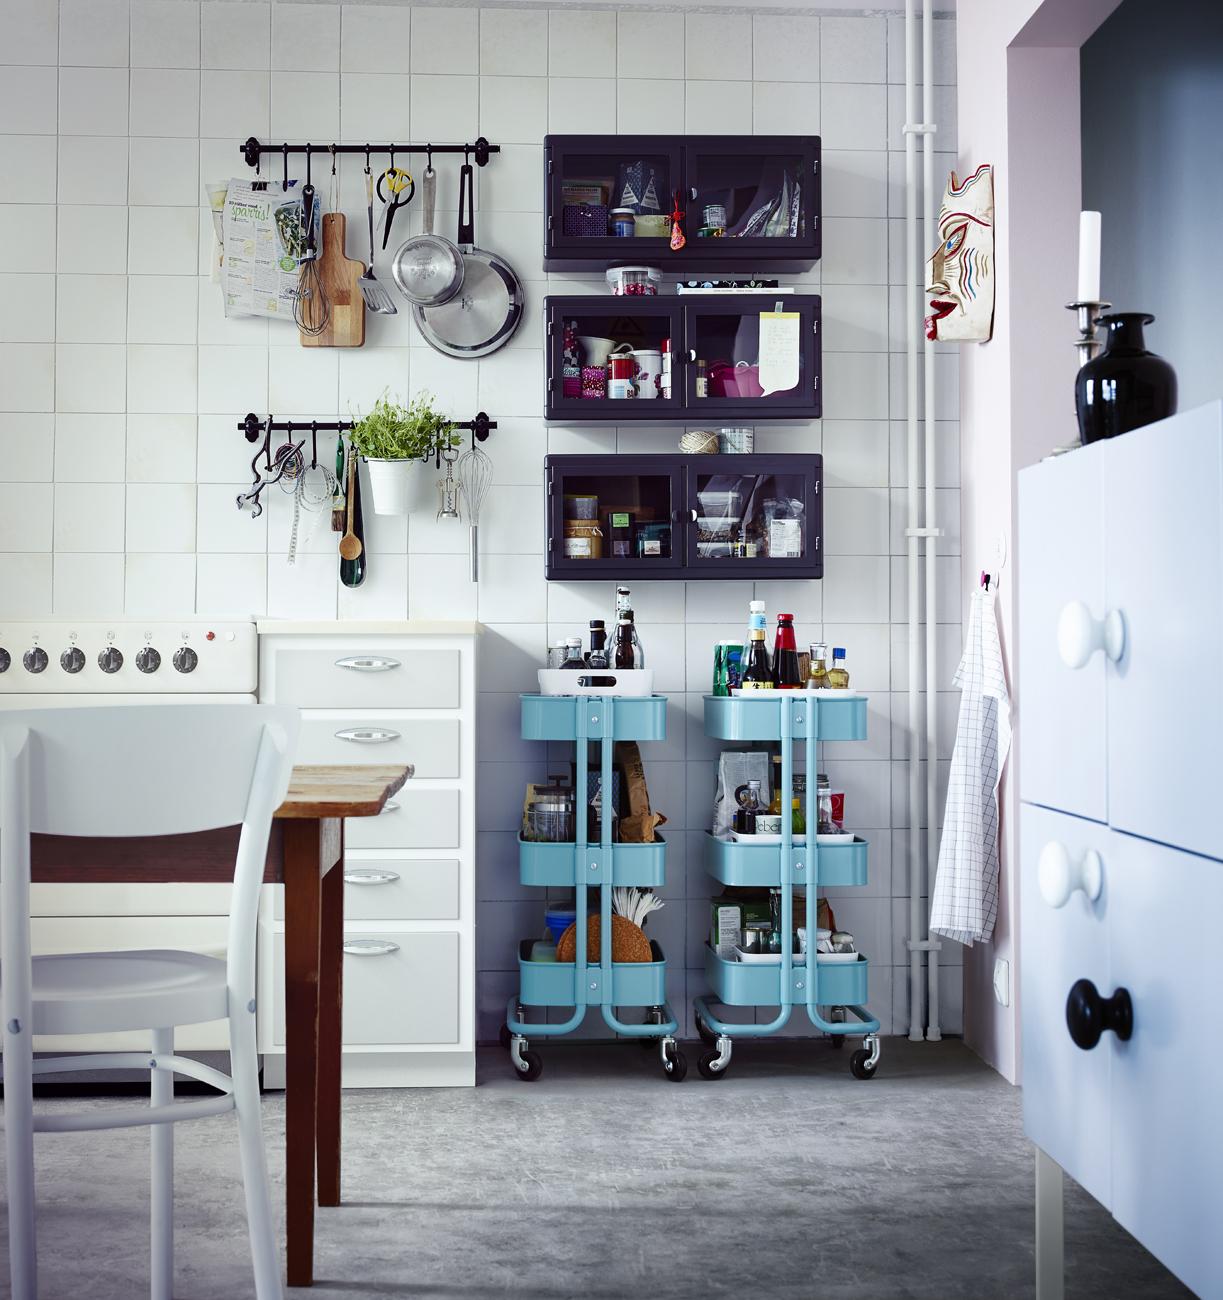 Binario Pensili Cucina Ikea restyling creativo in cucina - foto 1 livingcorriere